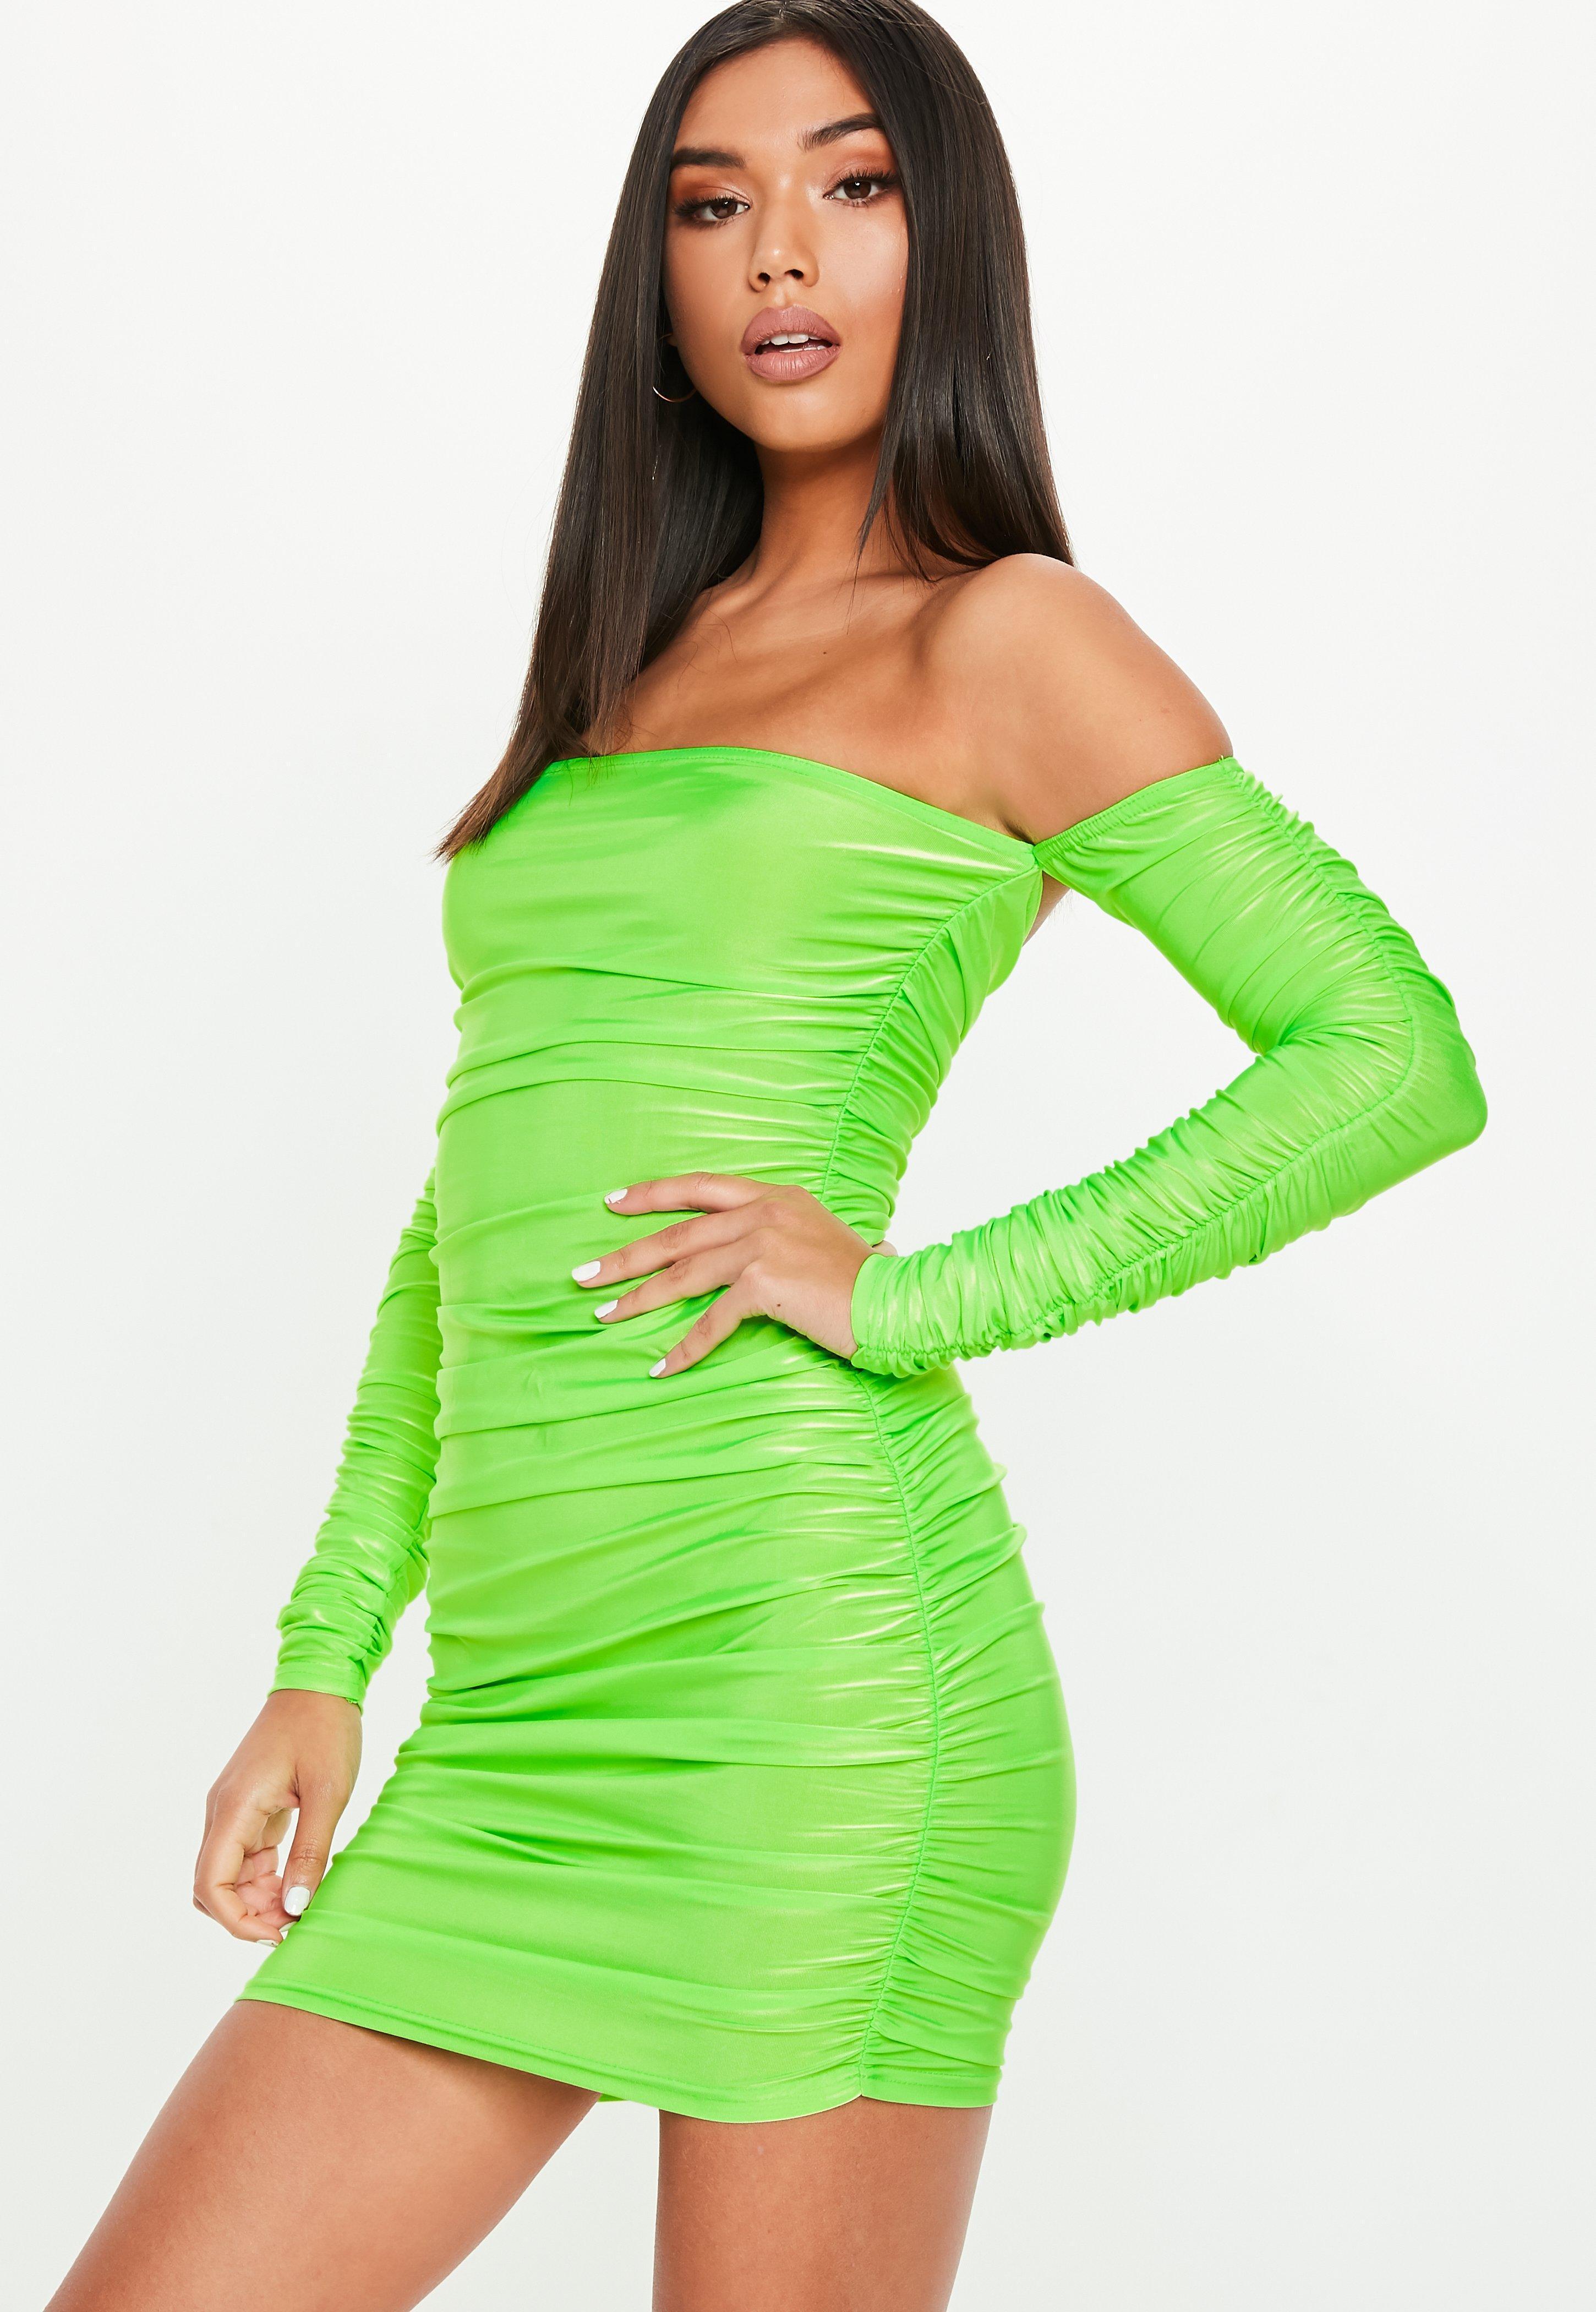 c9889123d238 Missguided Neon Green Bardot Ruched Mini Dress in Green - Lyst